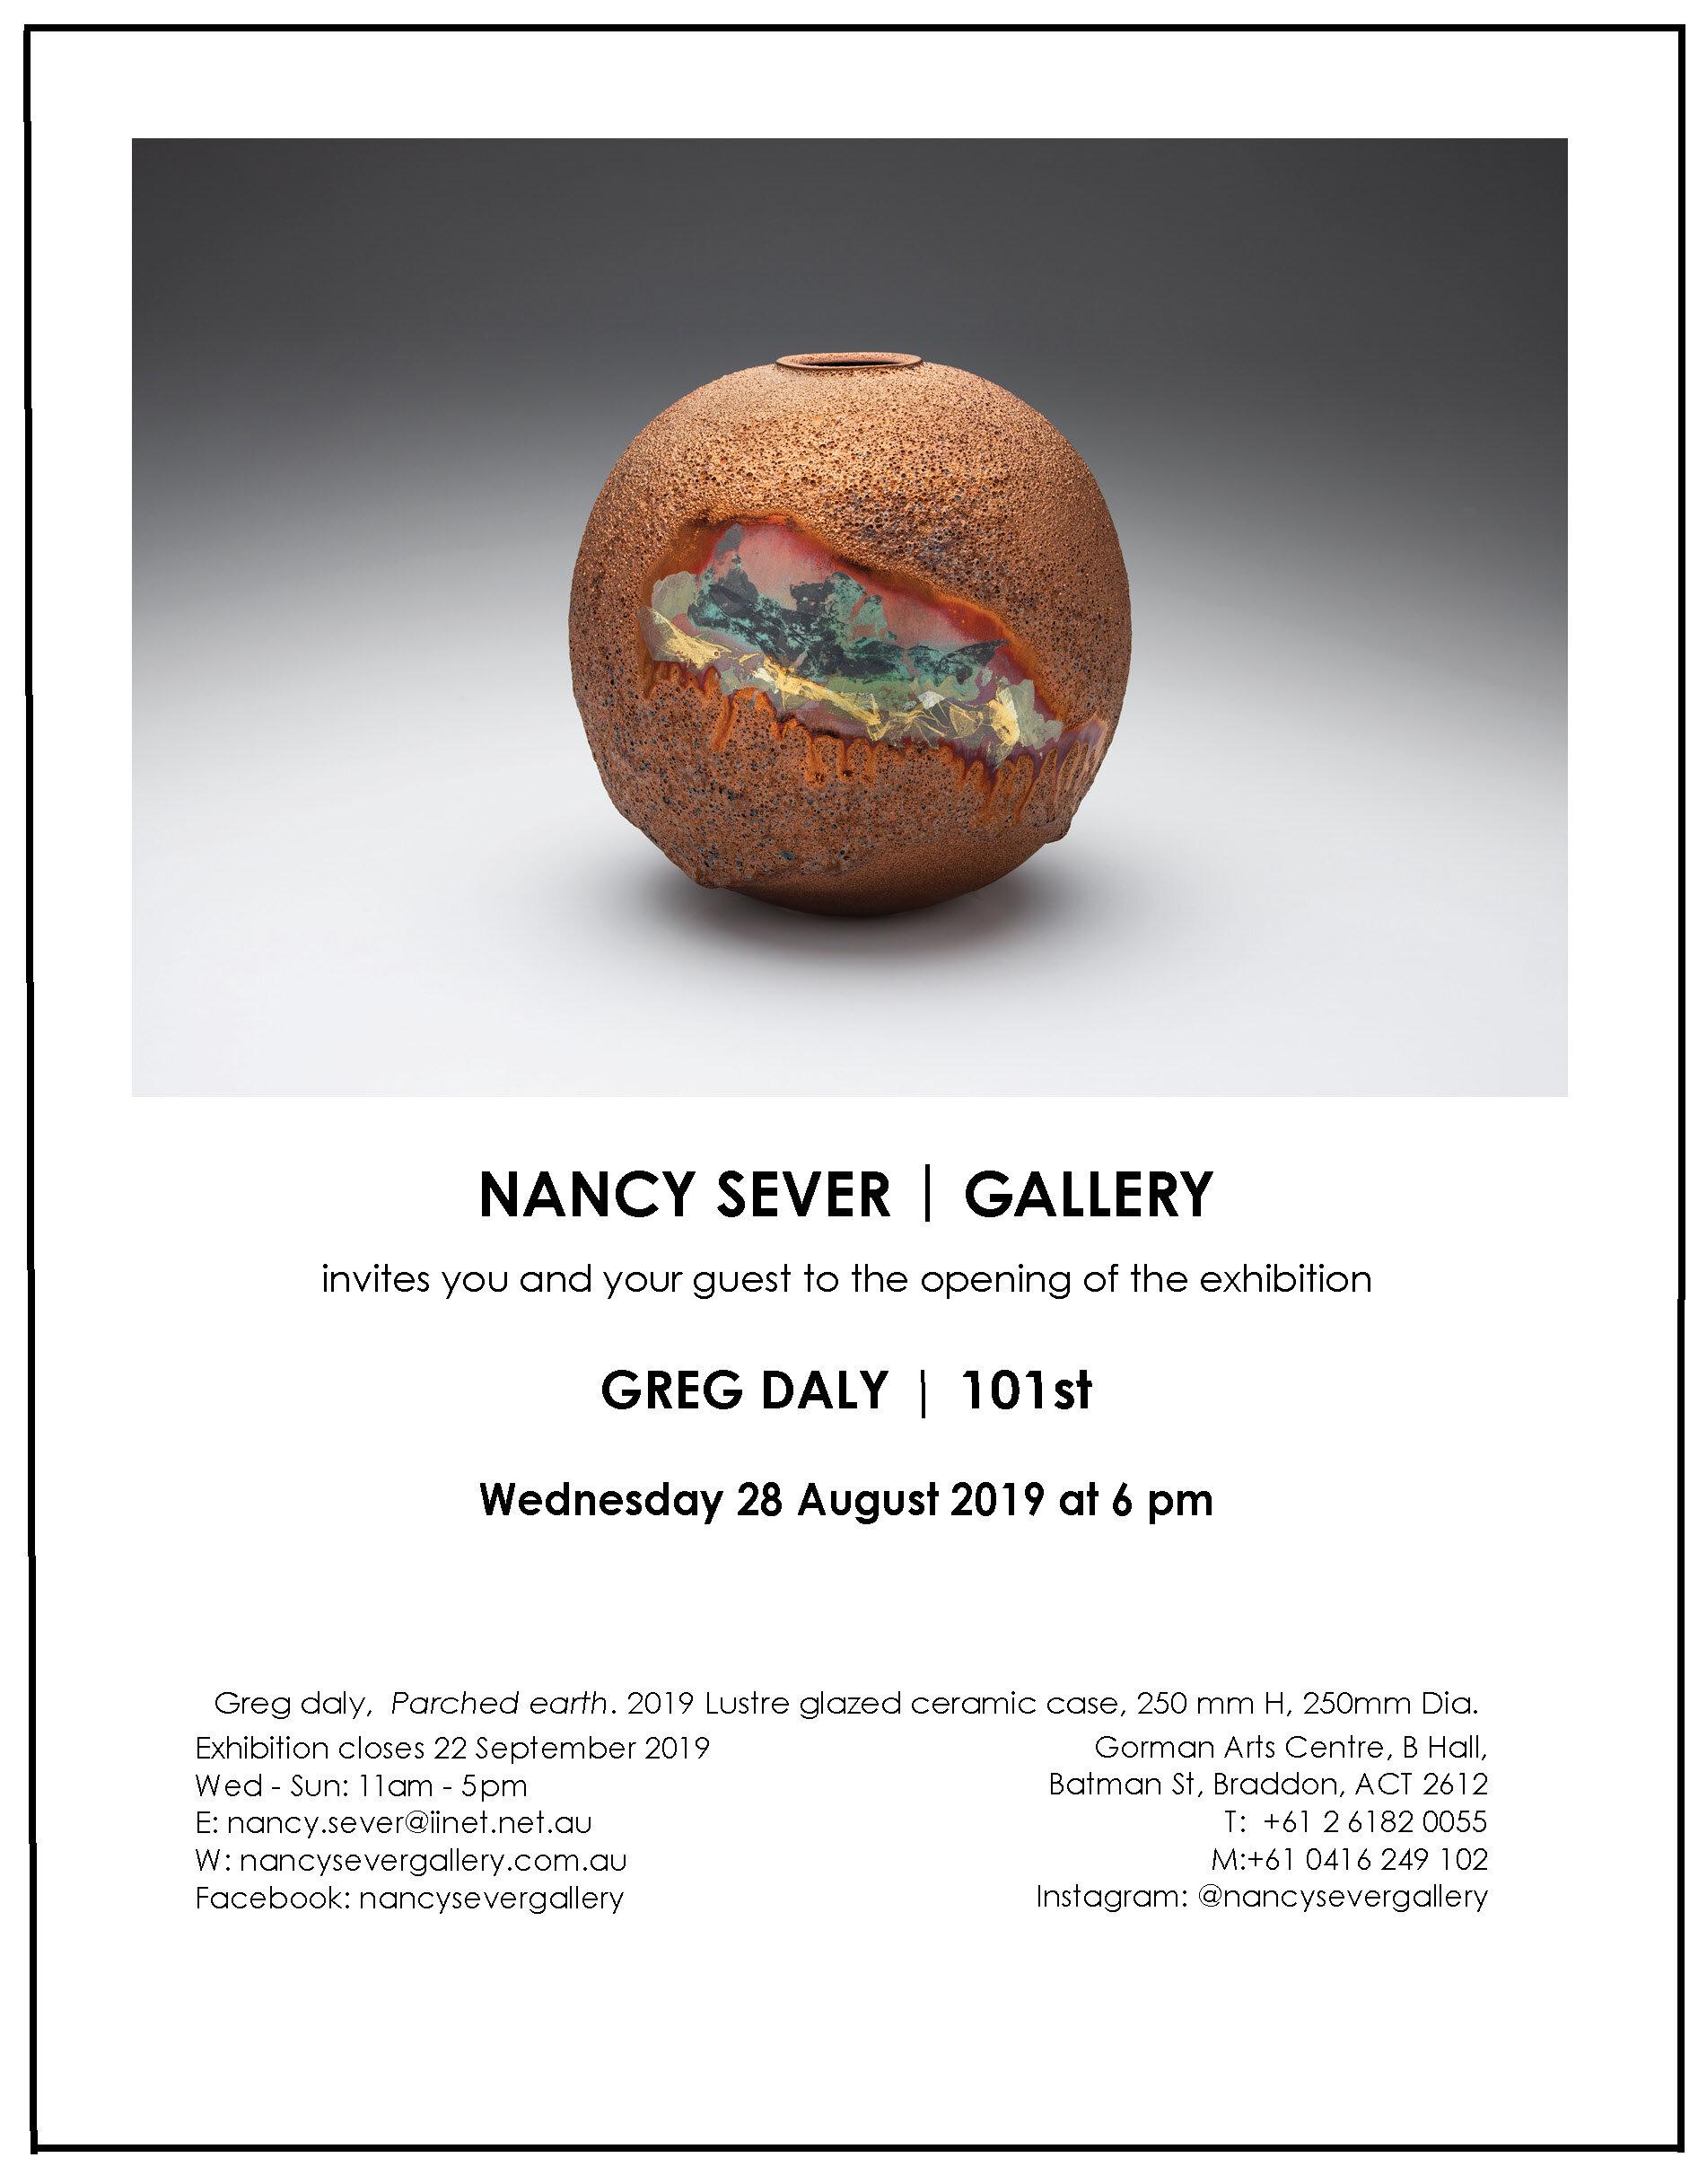 NSG.Greg Daly.2019 exhibition email invitation.jpg